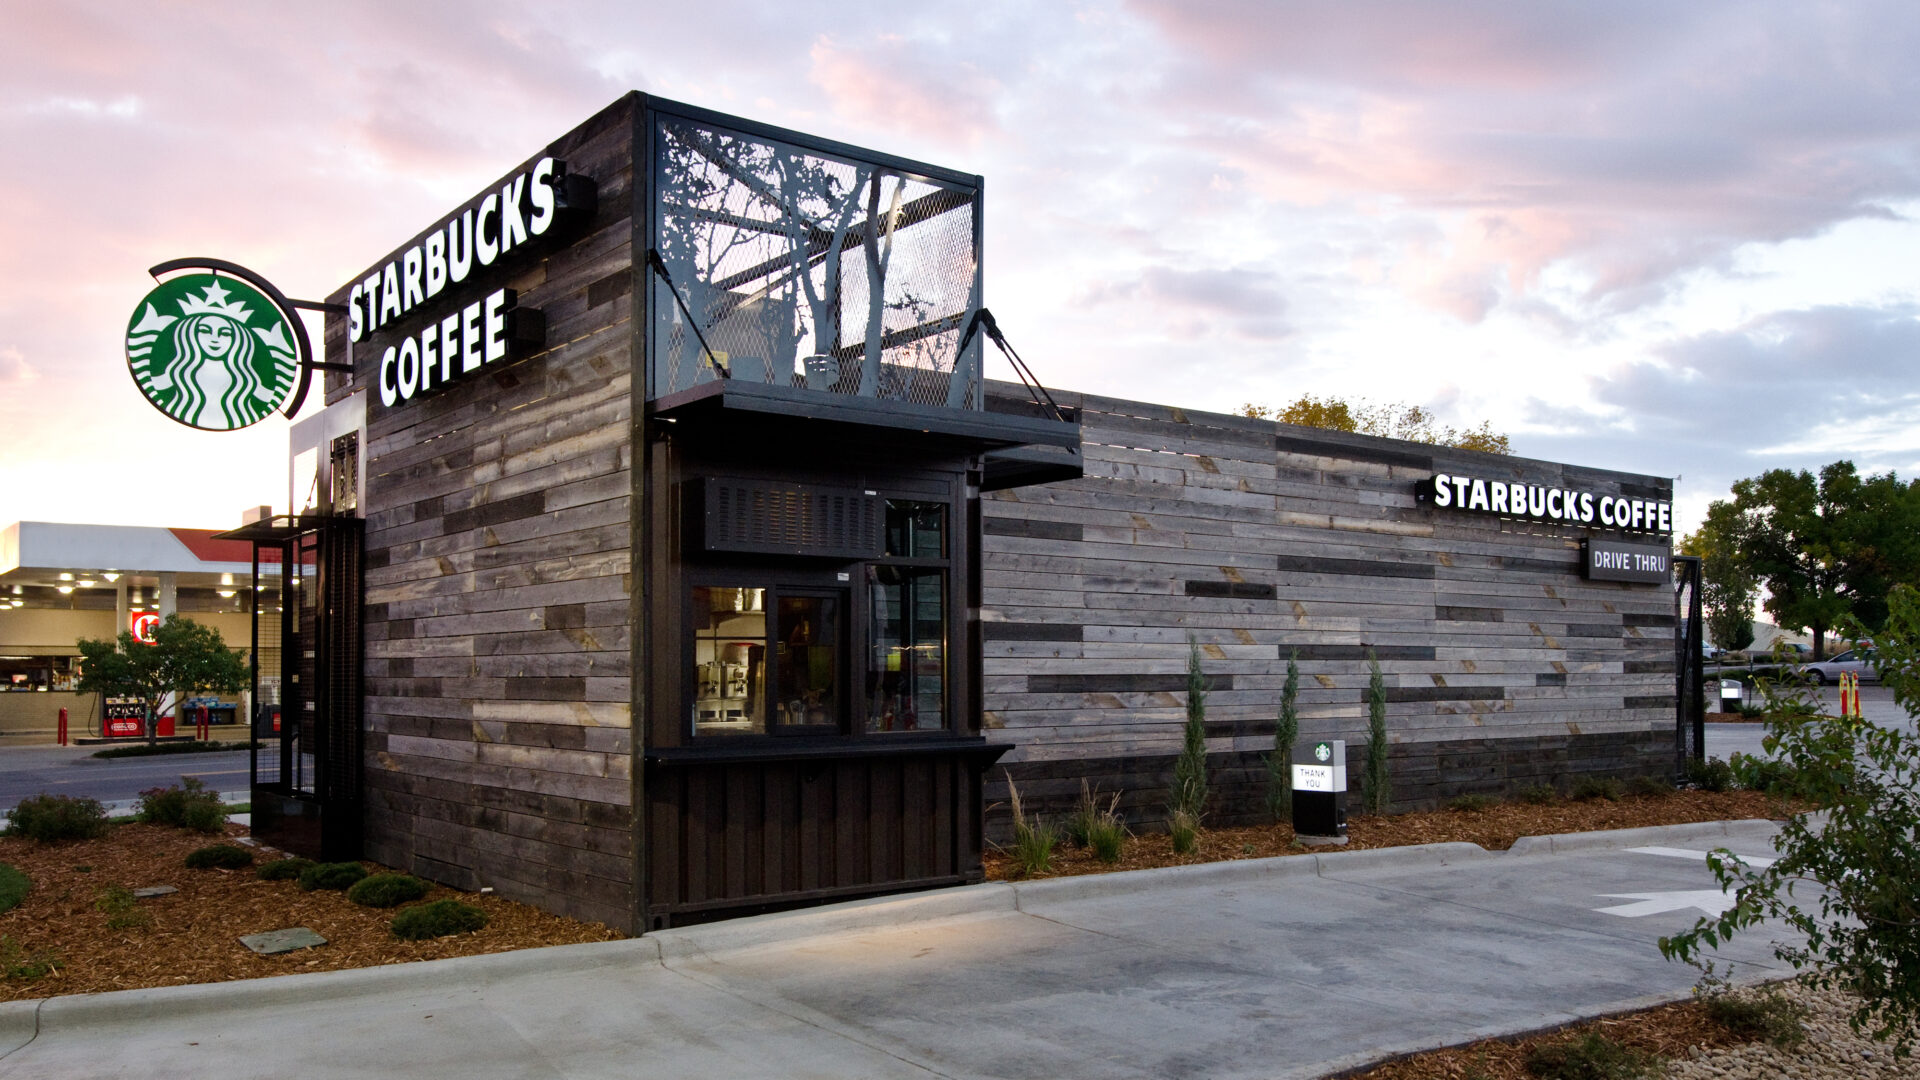 Starbucks Drive Thru in Denver